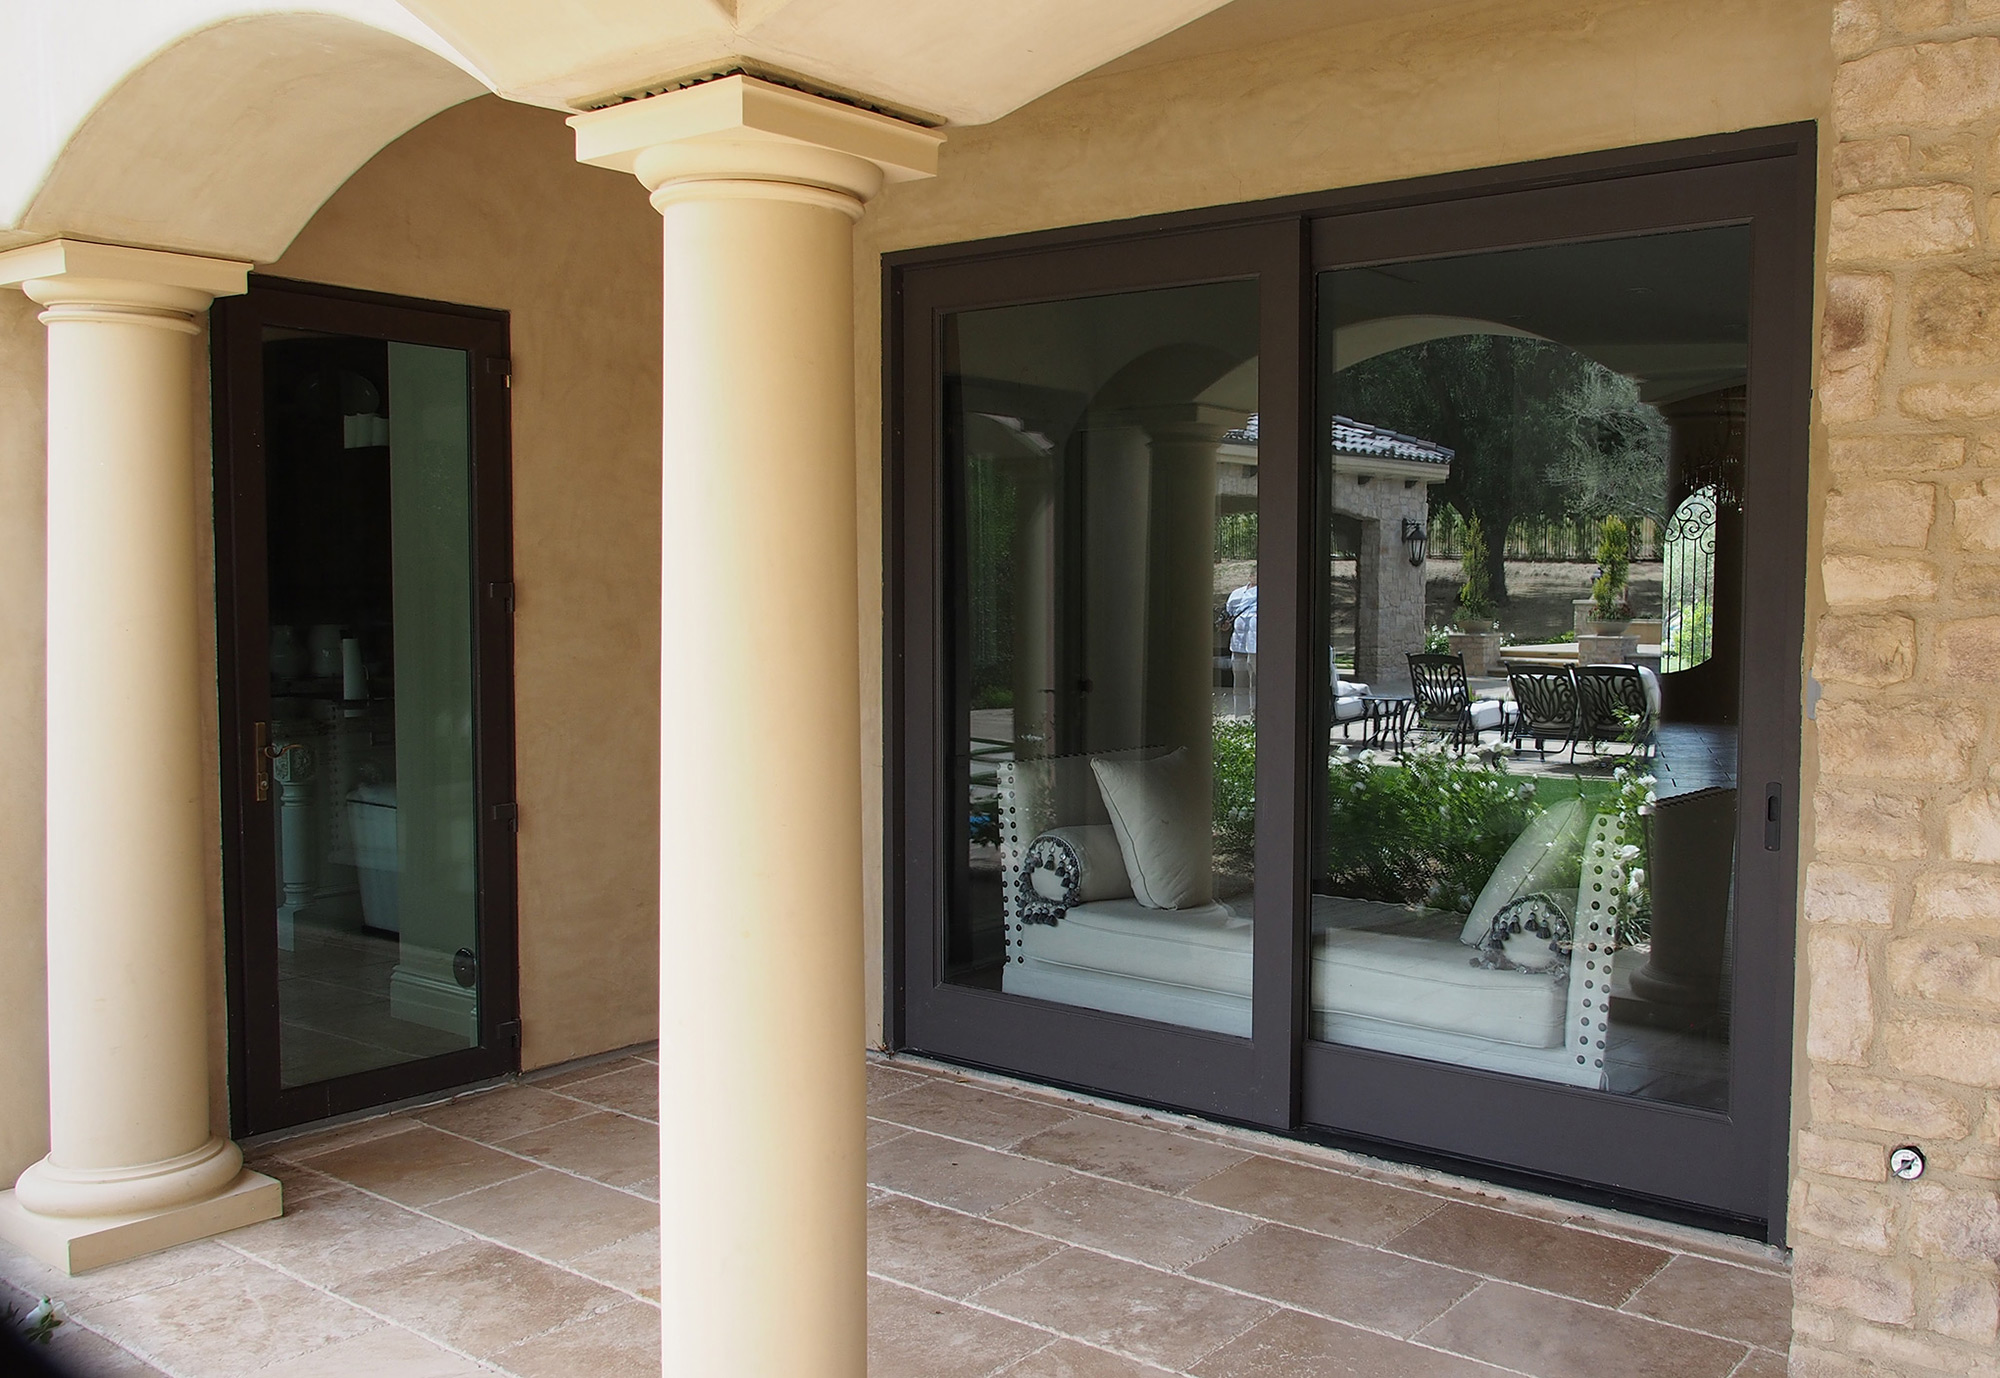 Sliding Glass Doors and Handles